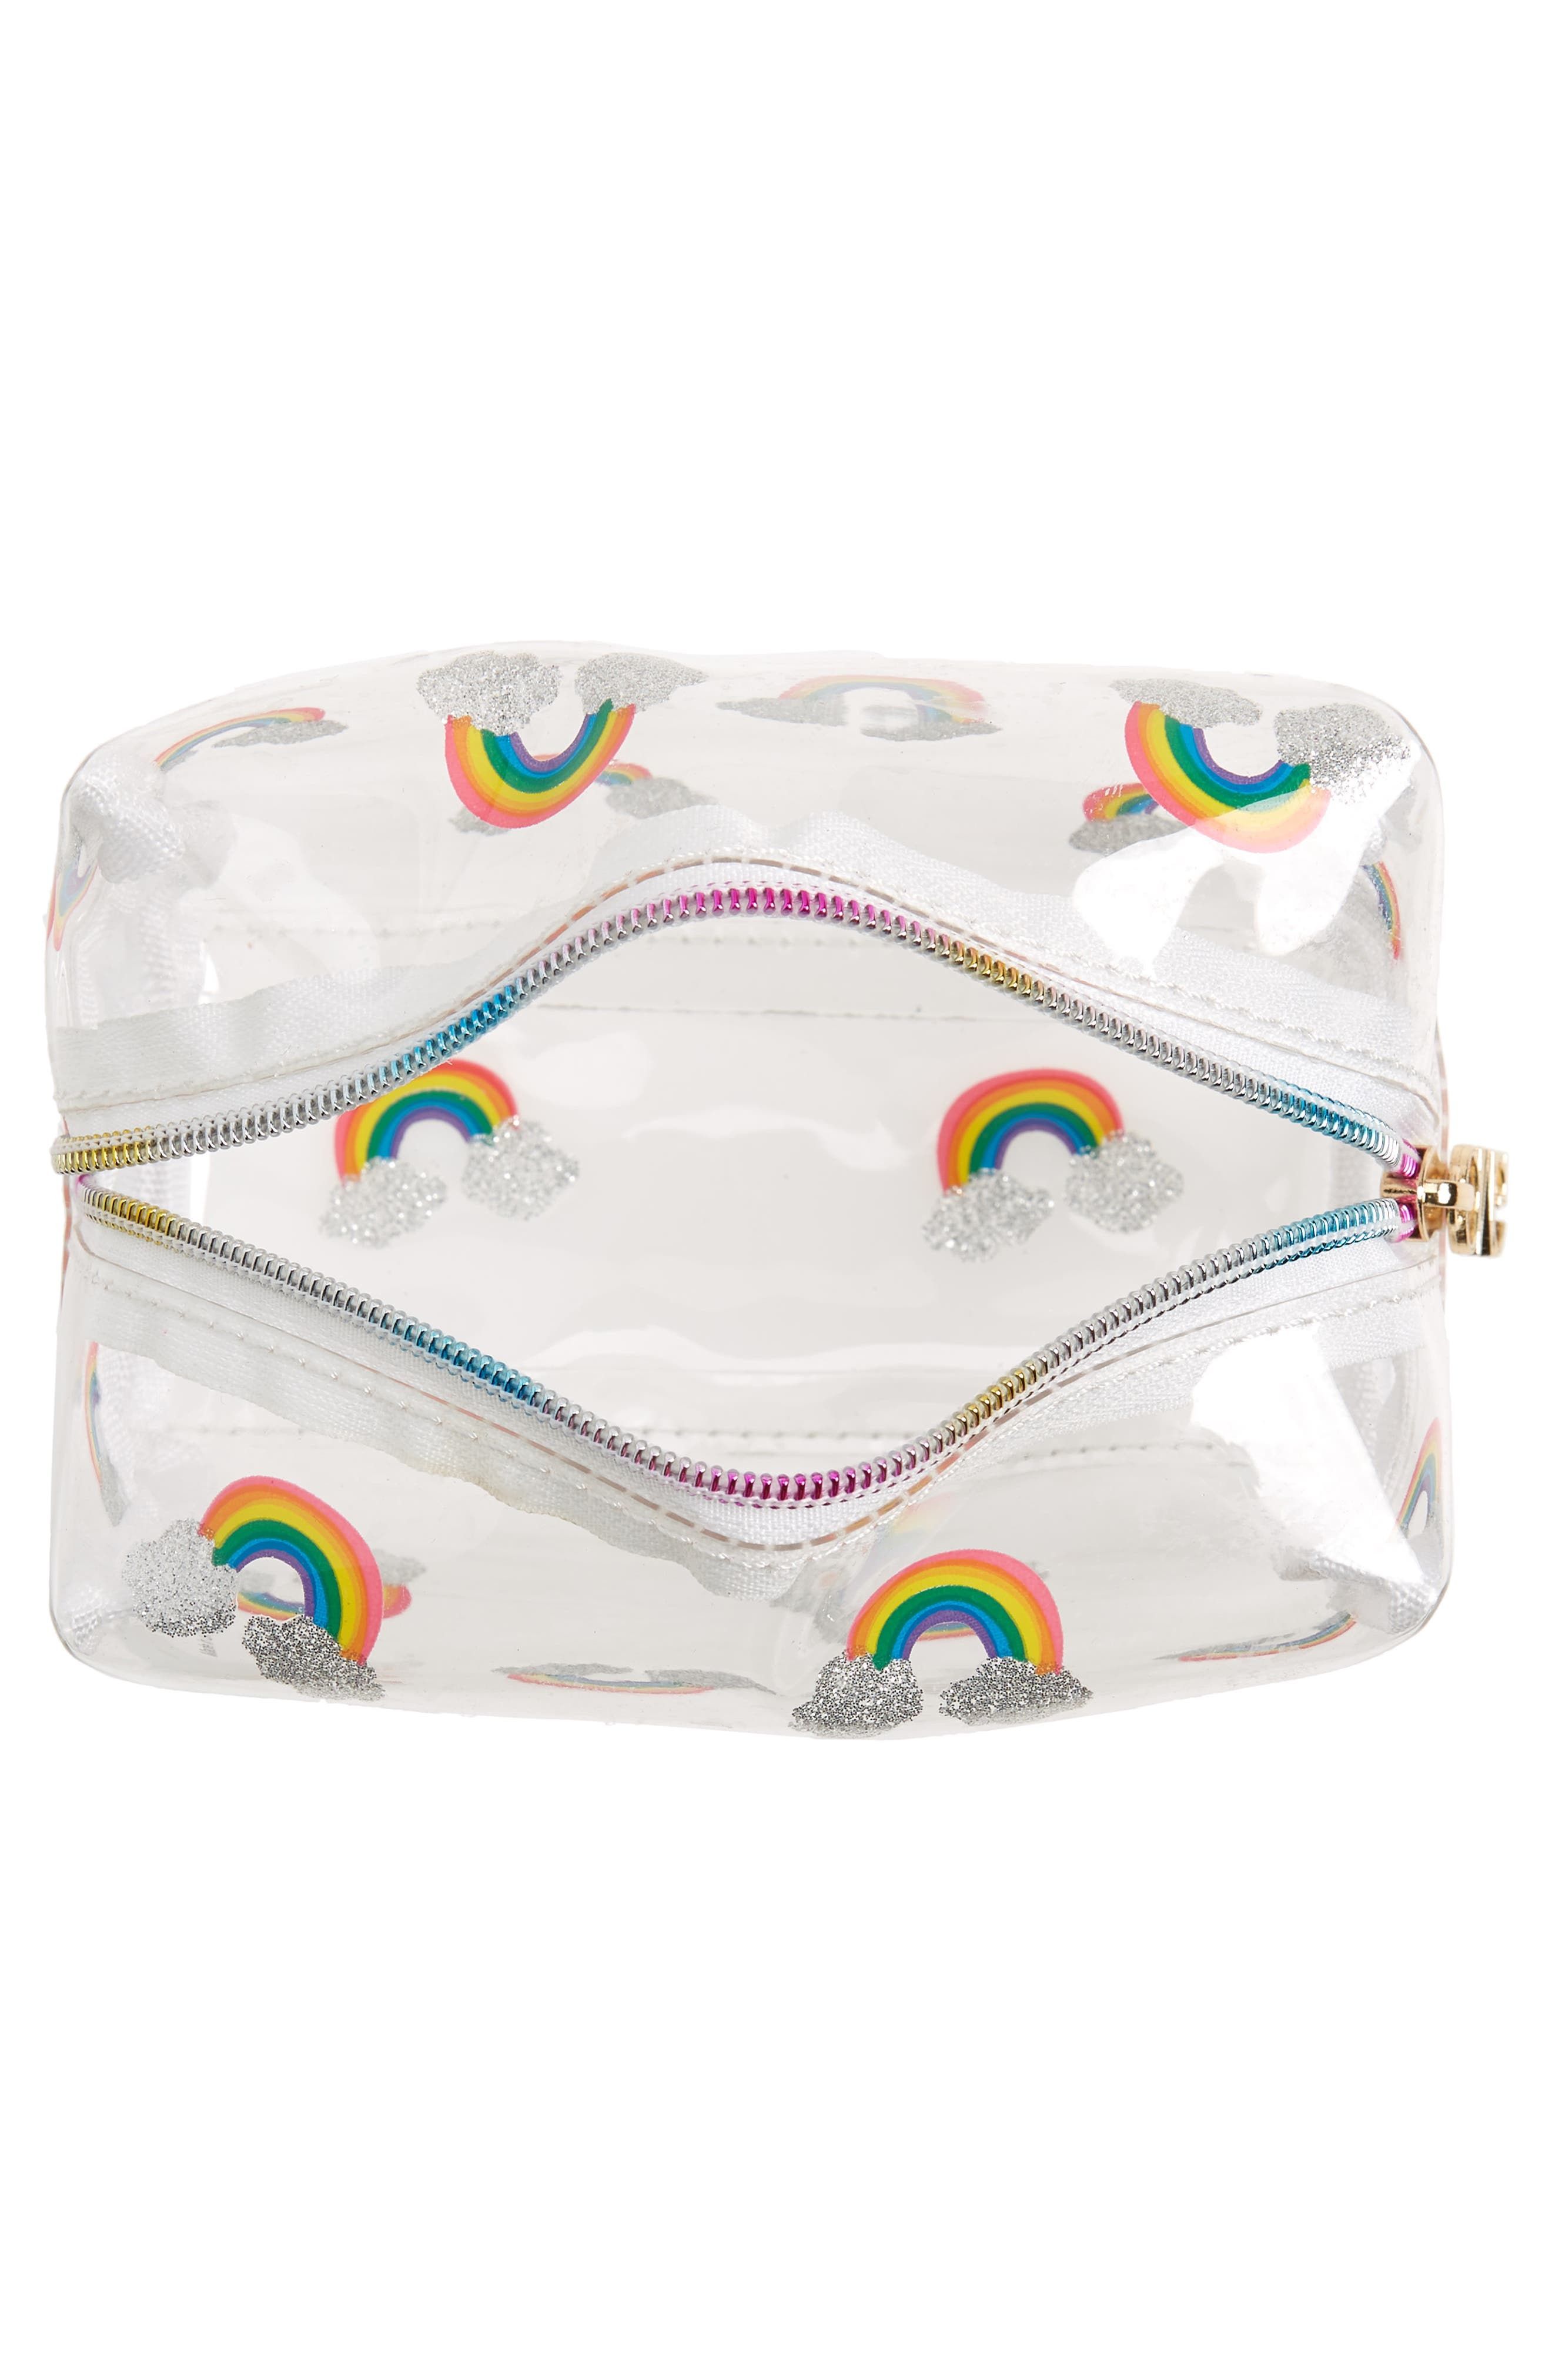 Rainbow Cosmetics Bag,                             Alternate thumbnail 3, color,                             Multi